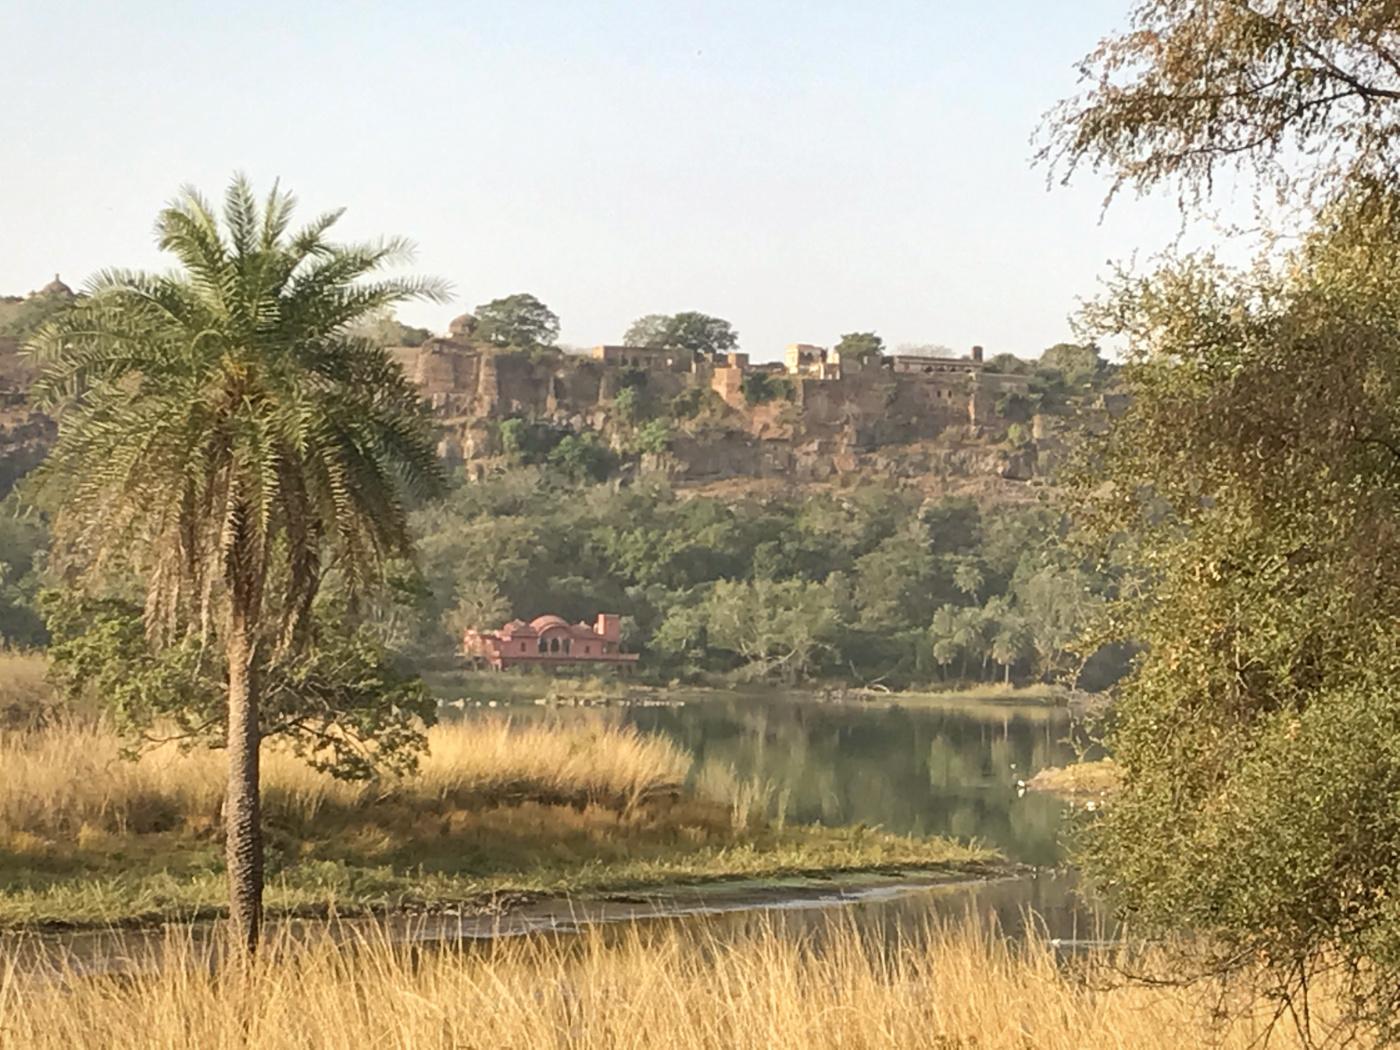 102-India-Ranthambore